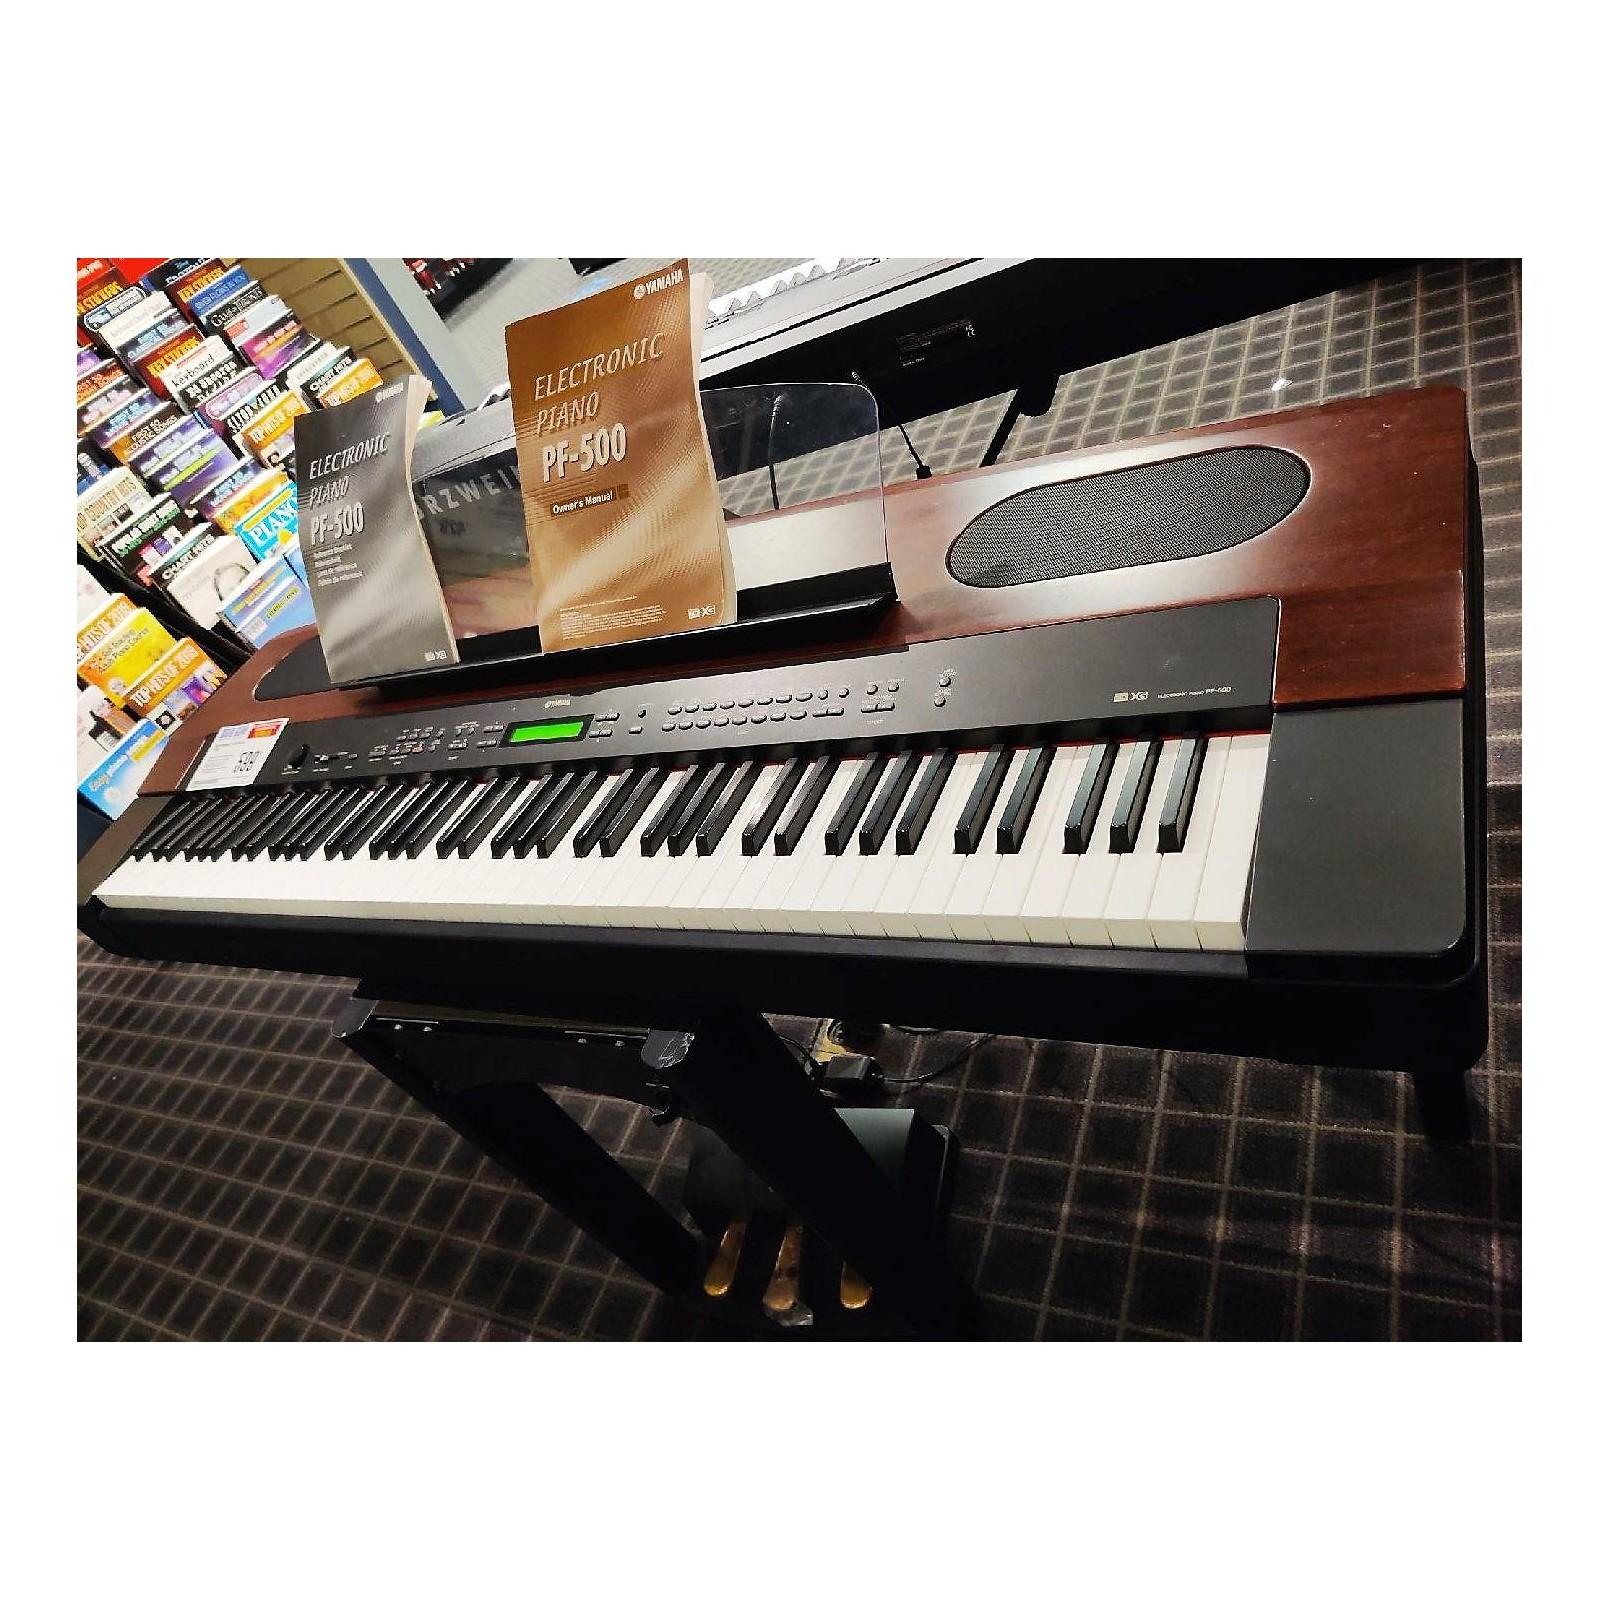 Yamaha PF-500 Digital Piano